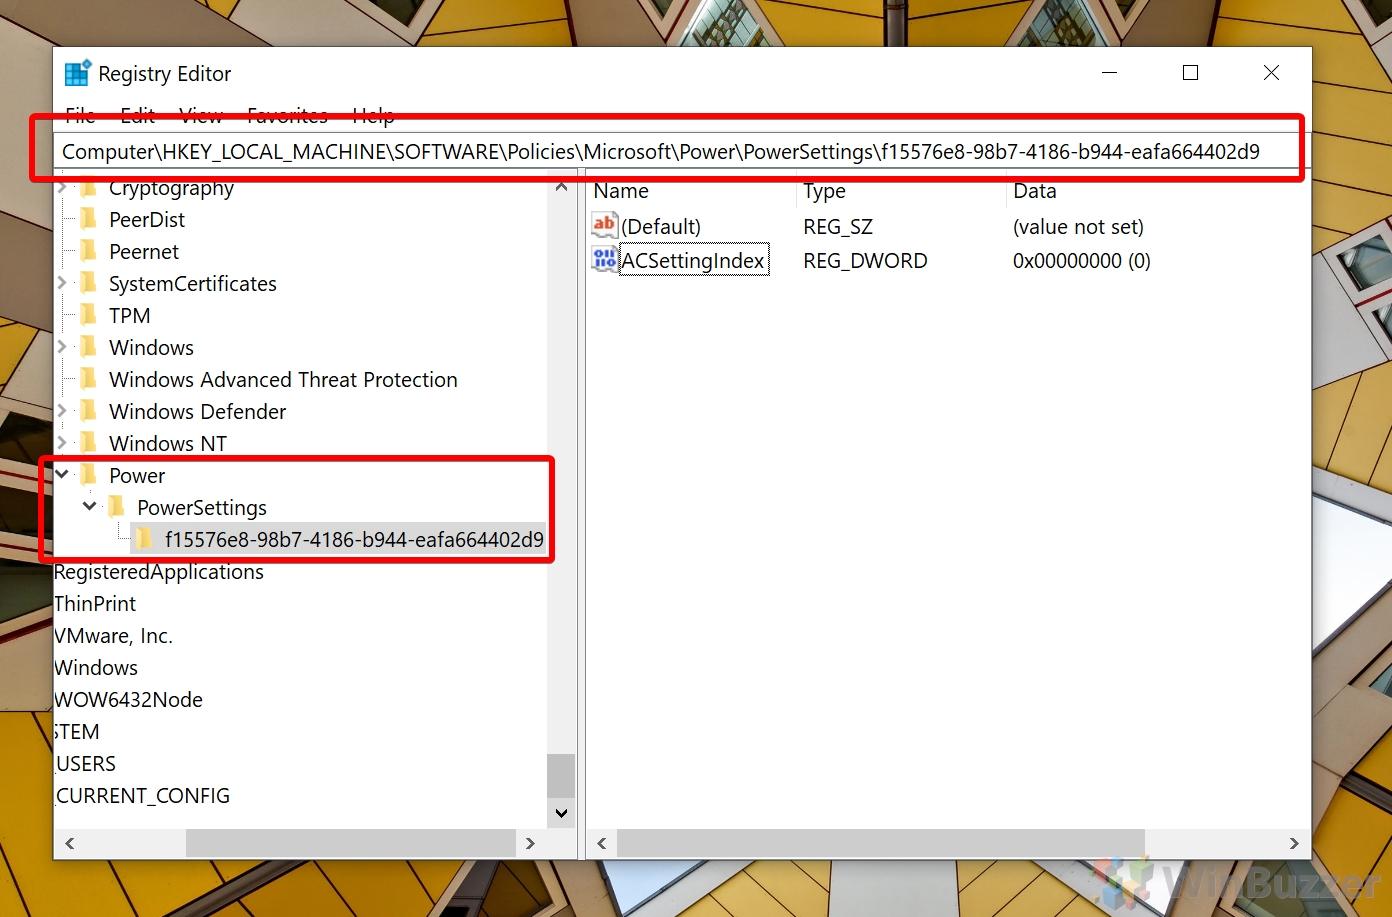 Windows 10 - Search - Registry Editor - Power Settings